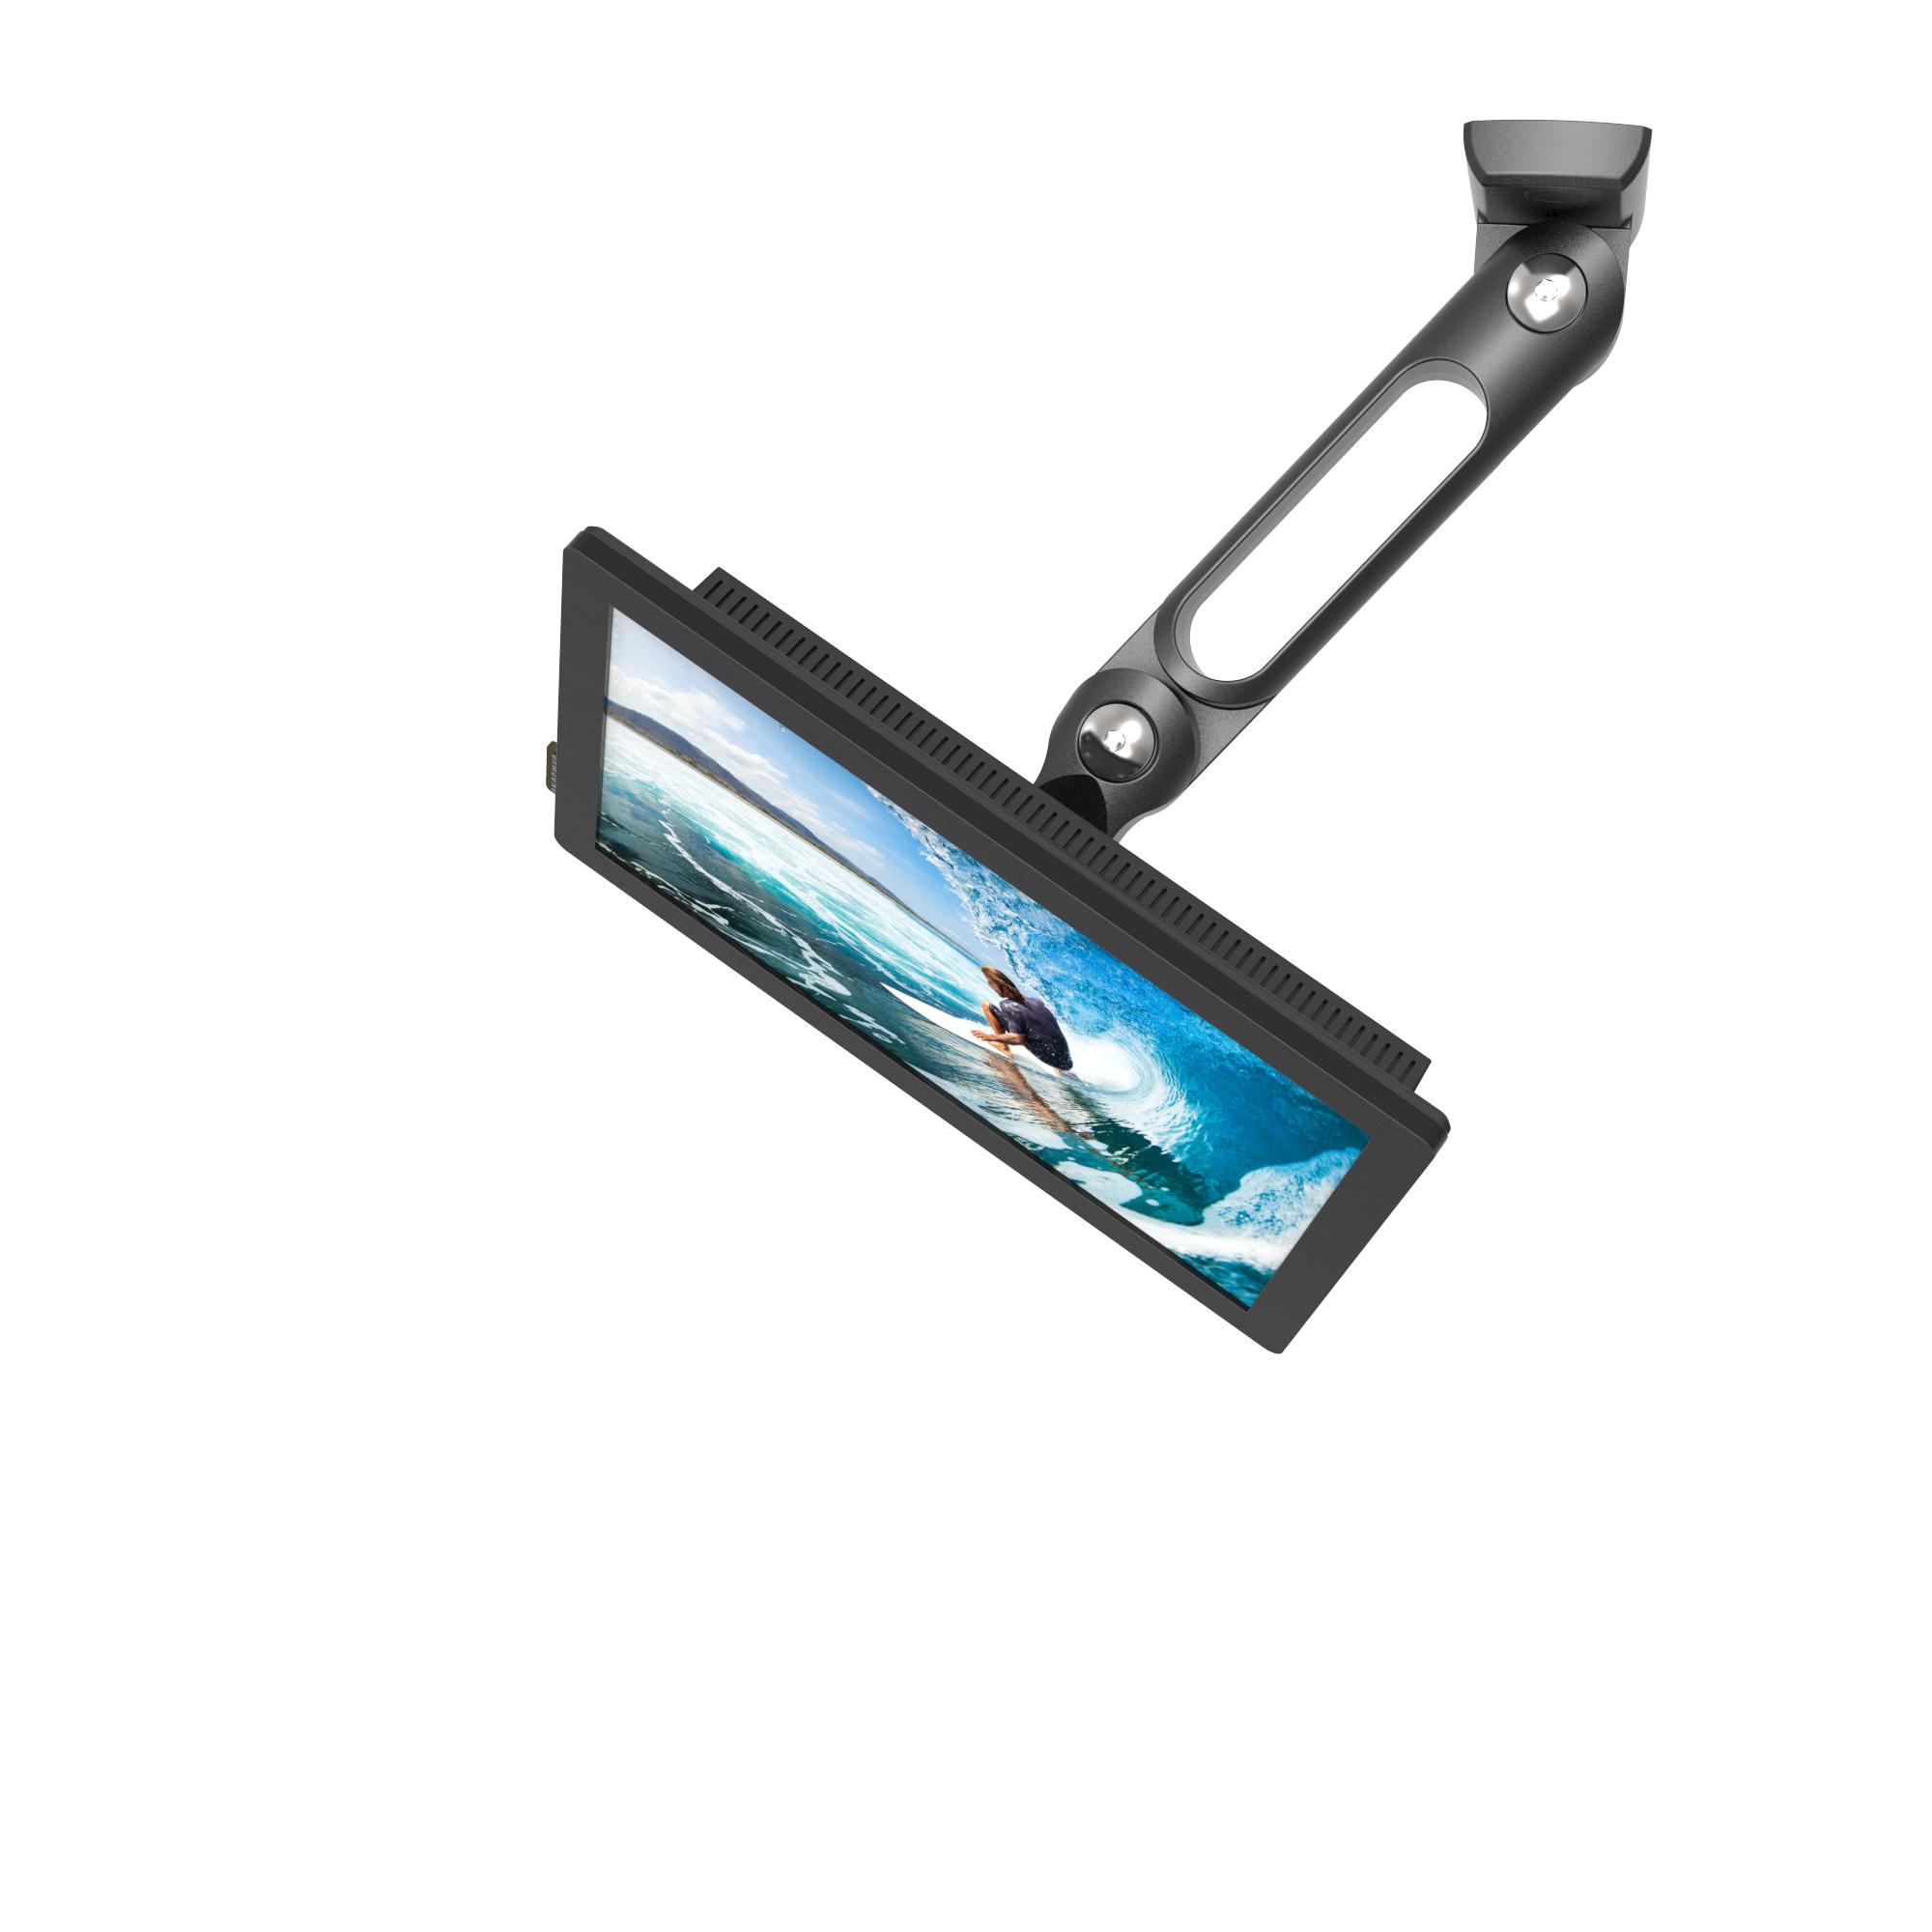 Compulocks Swing Arm Samsung TouchScreen Wall Mount Black - Mounting kit (swing arm) for tablet - hi